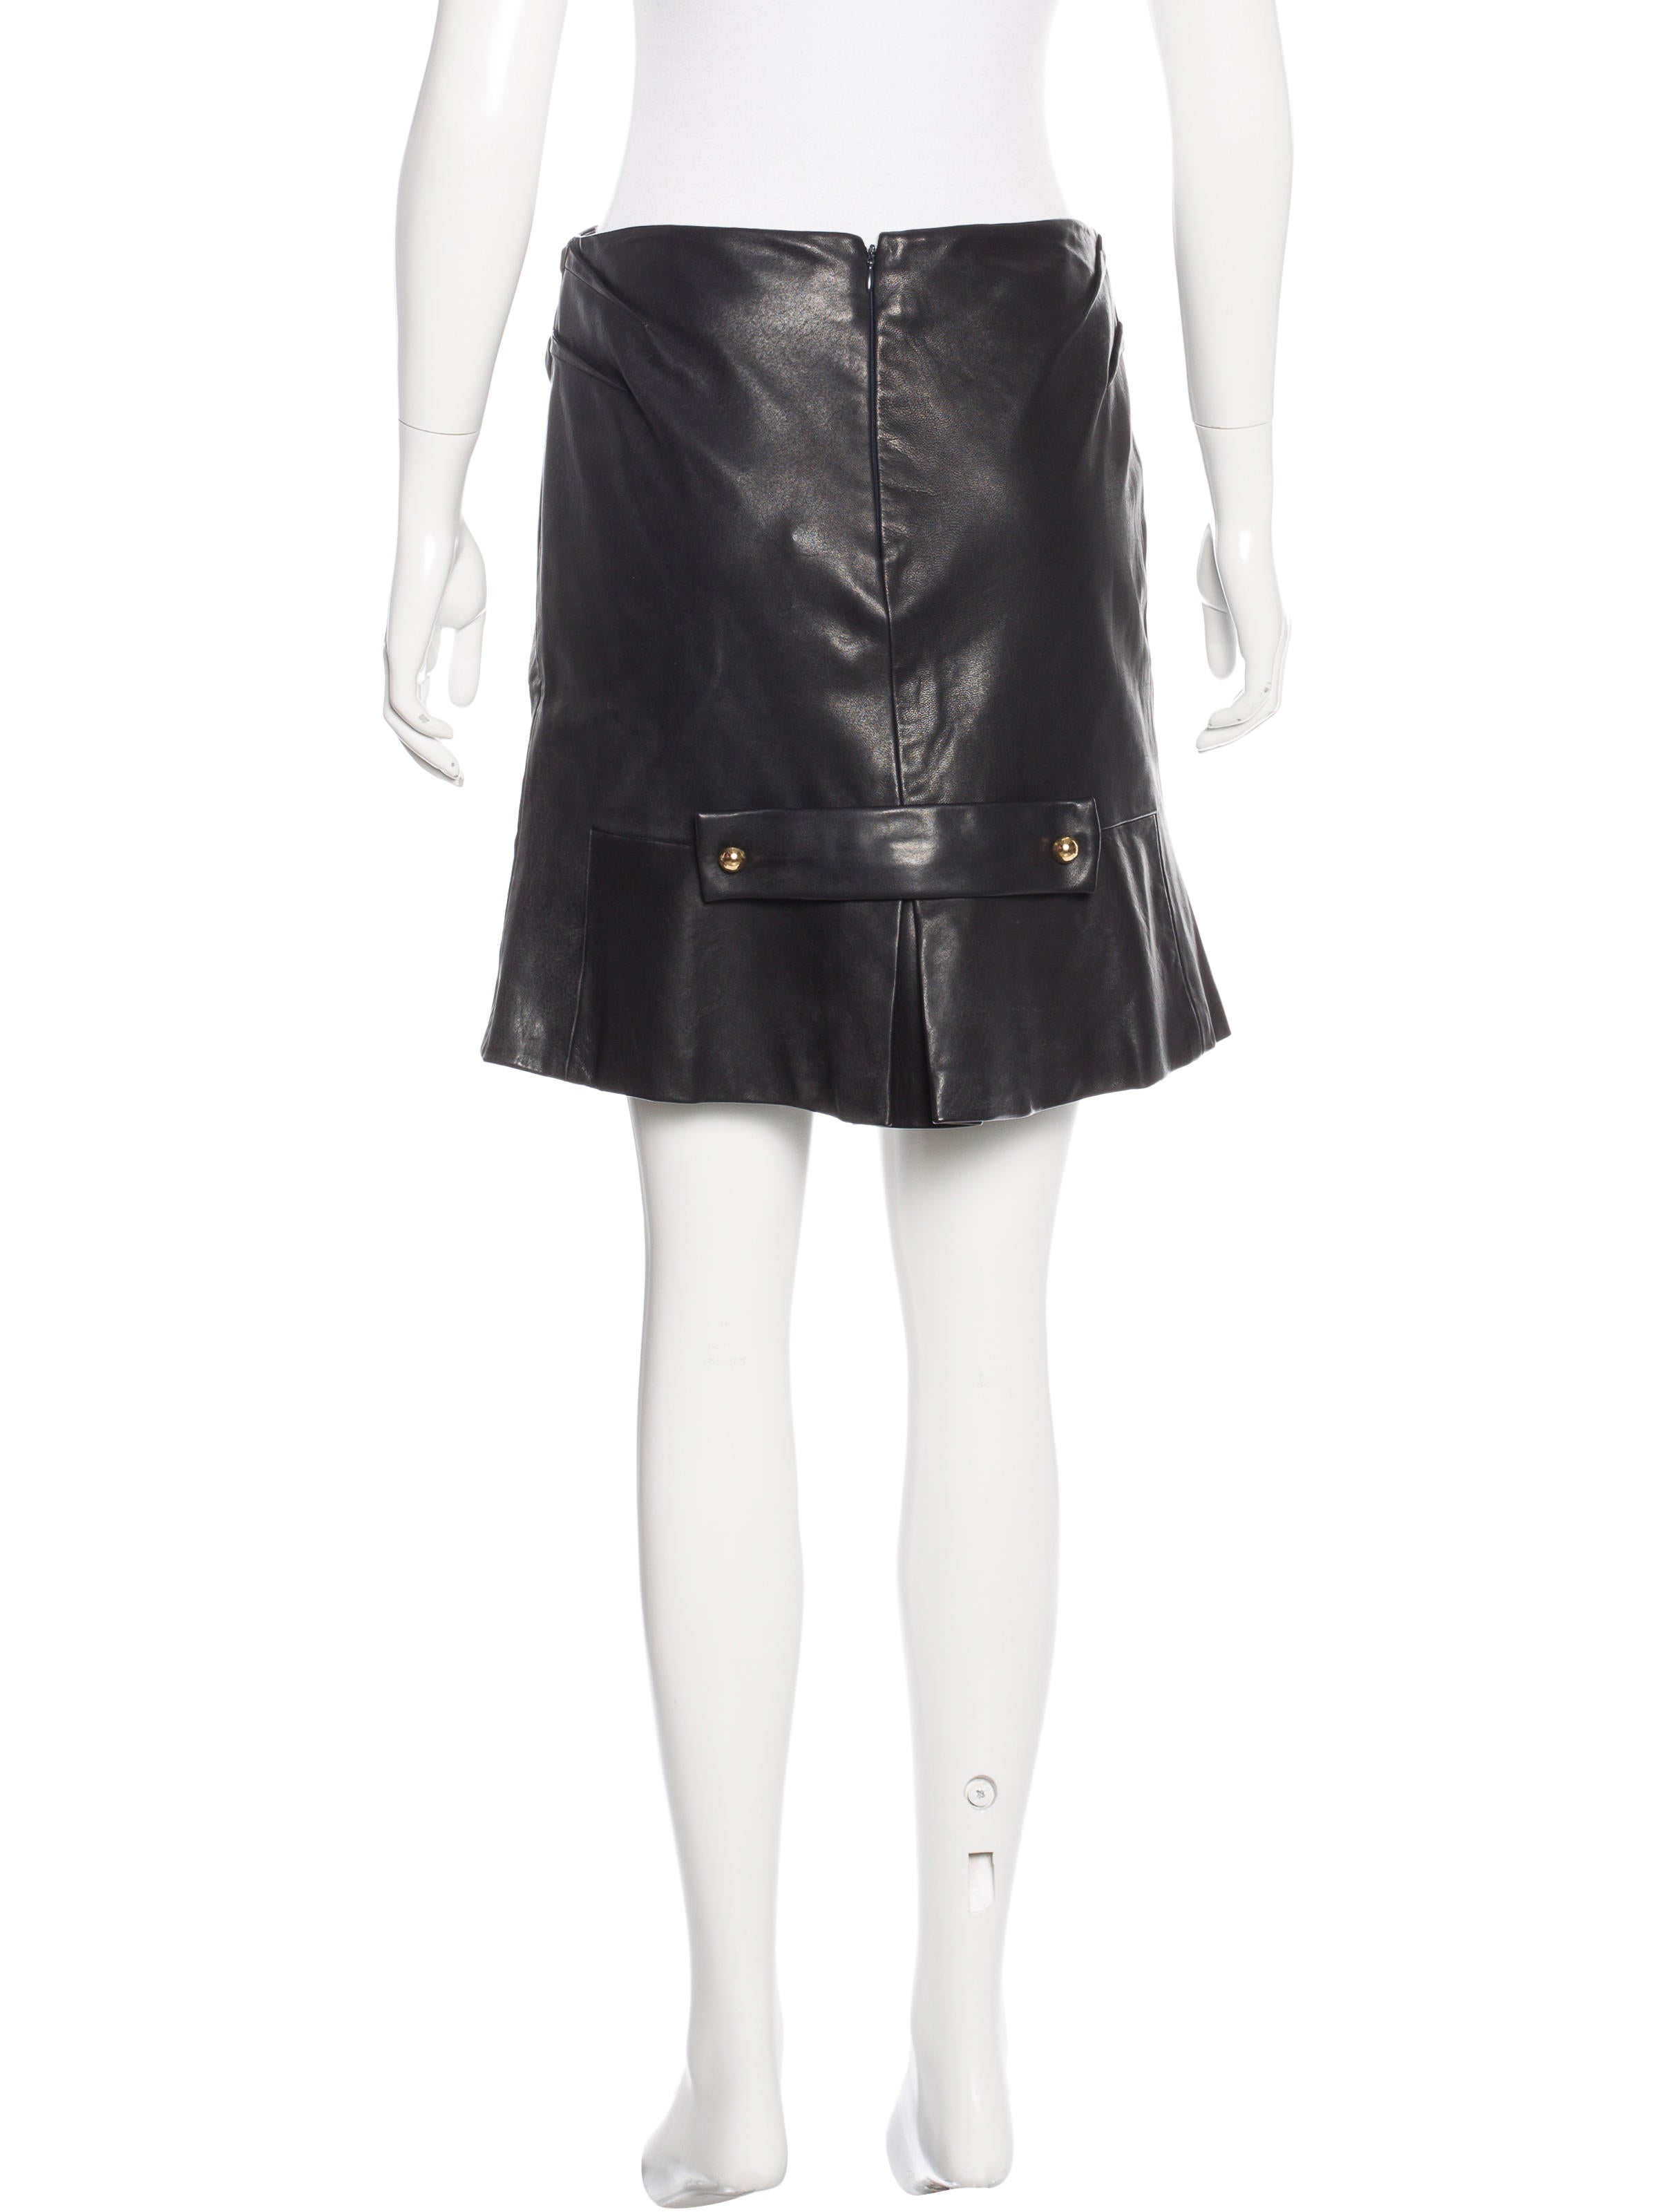 prabal gurung leather skirt clothing prb21524 the